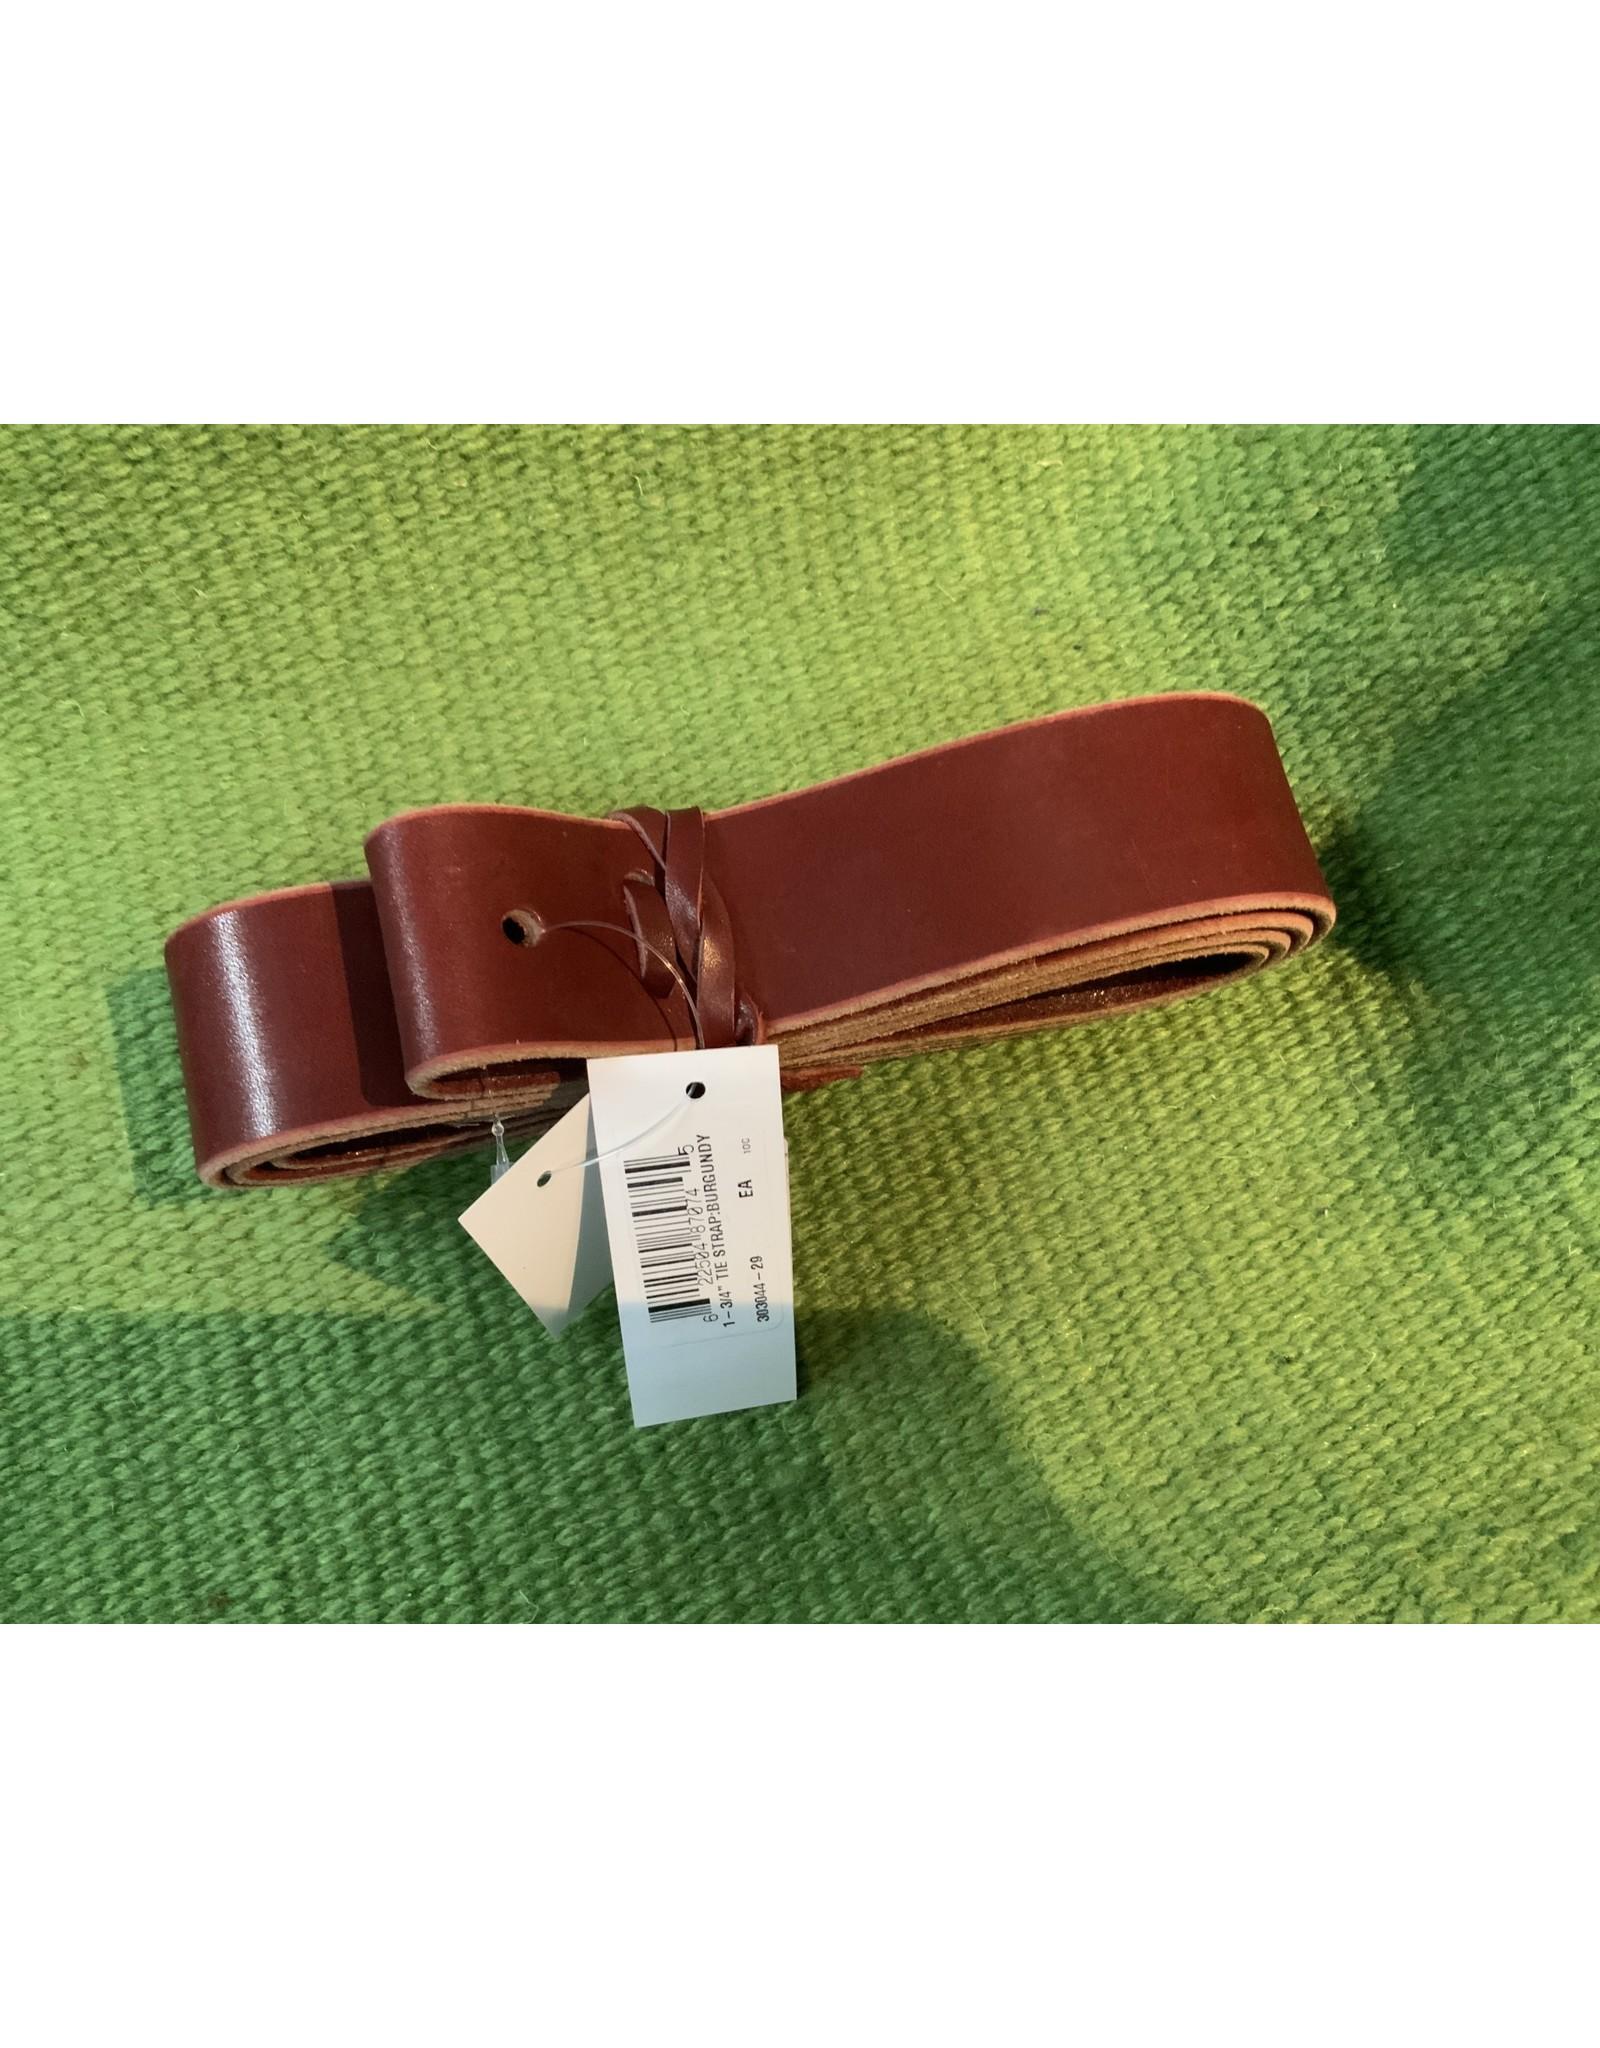 "BB* 1-1/4"" Tie Strap - Burgundy -303042-29  9999*N not wide"